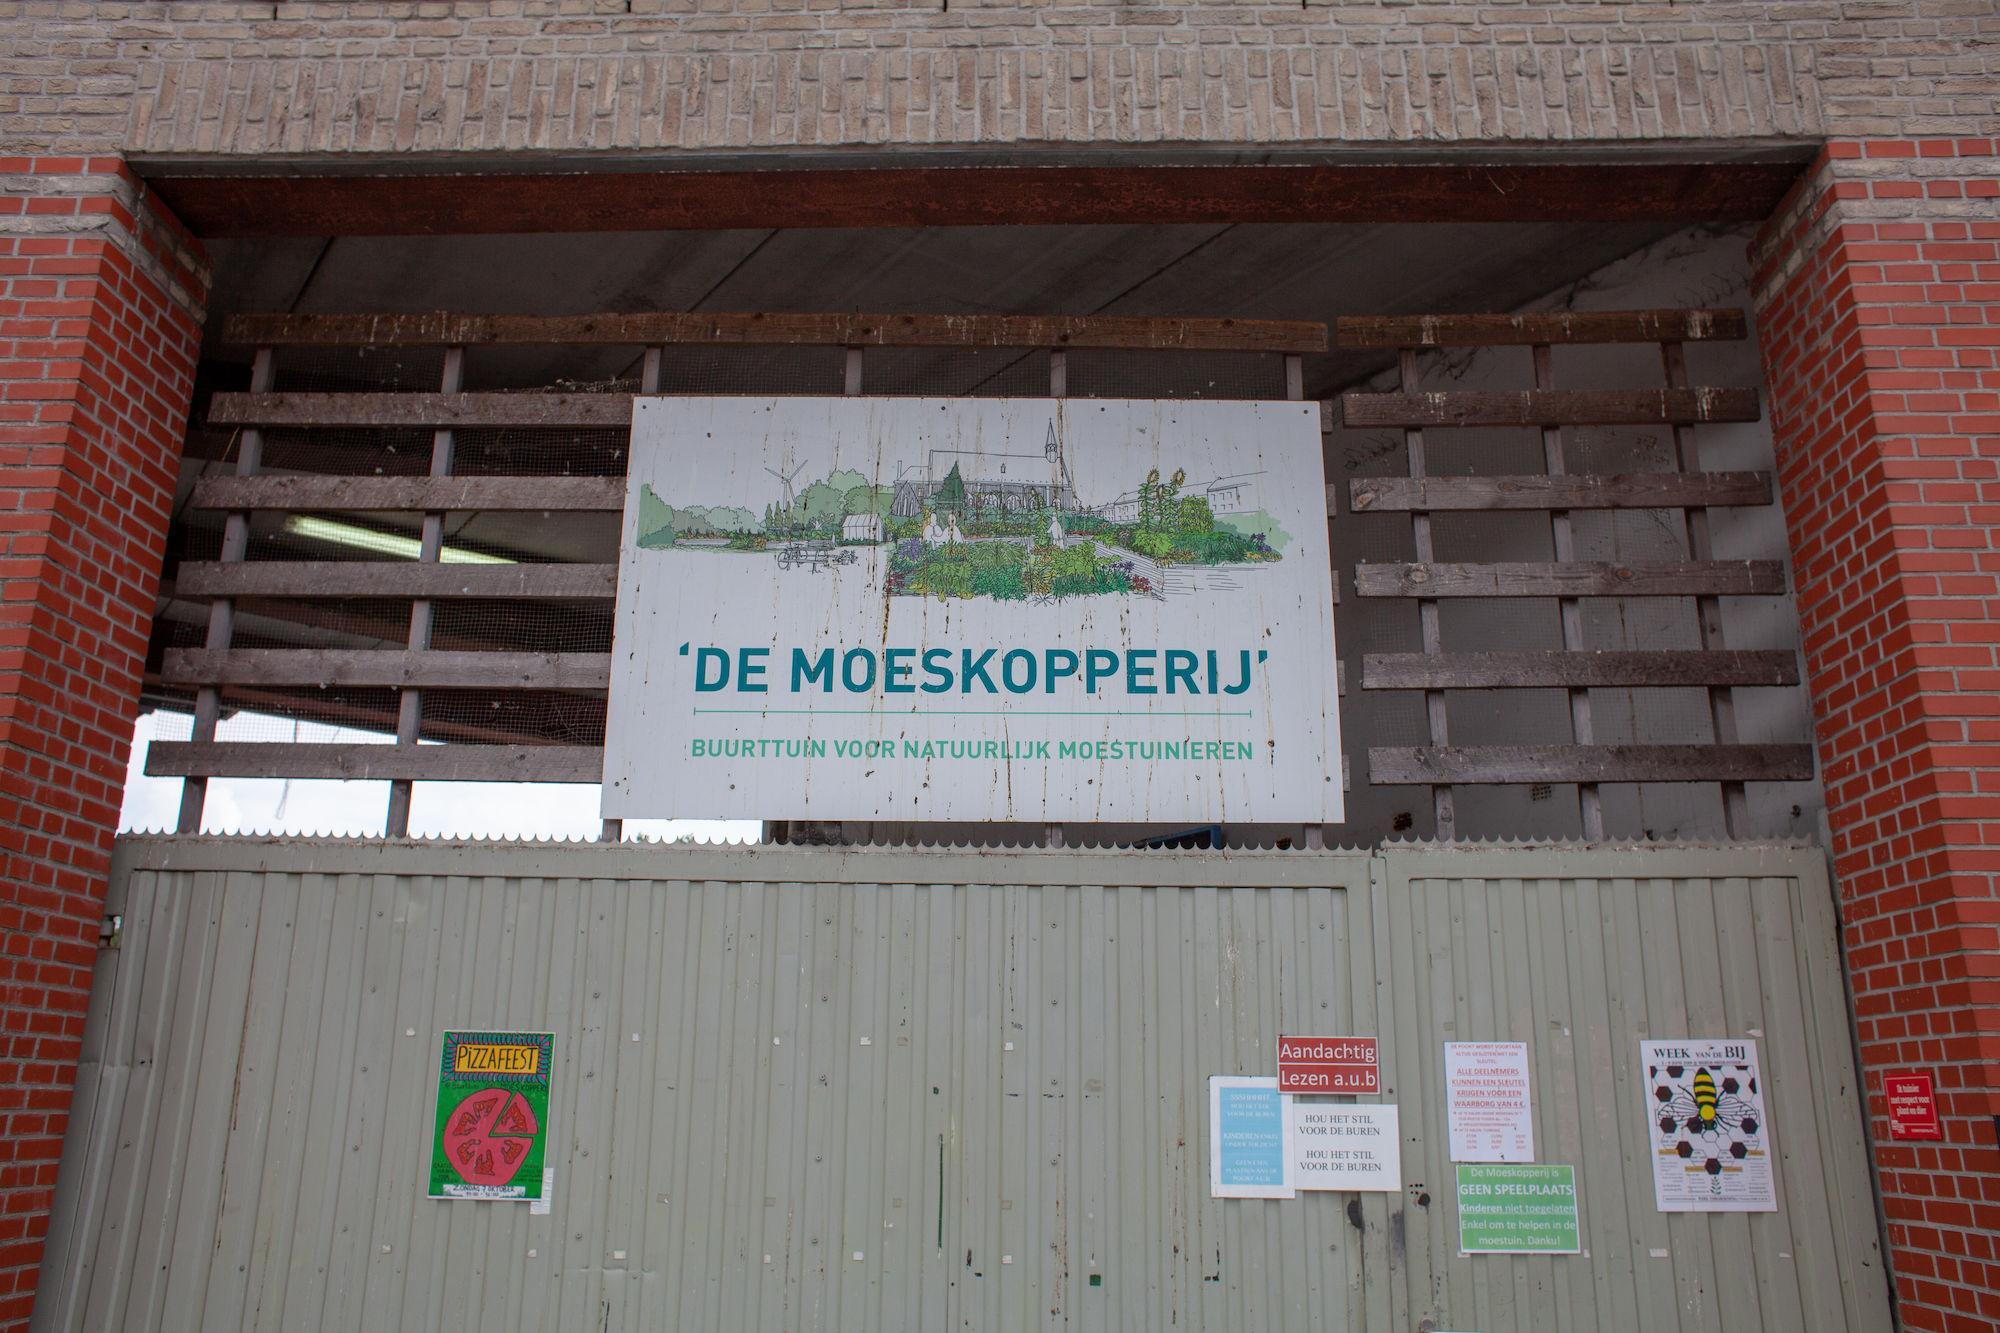 2019-07-02 Muide Meulestede prospectie Wannes_stadsvernieuwing_IMG_0306-3.jpg